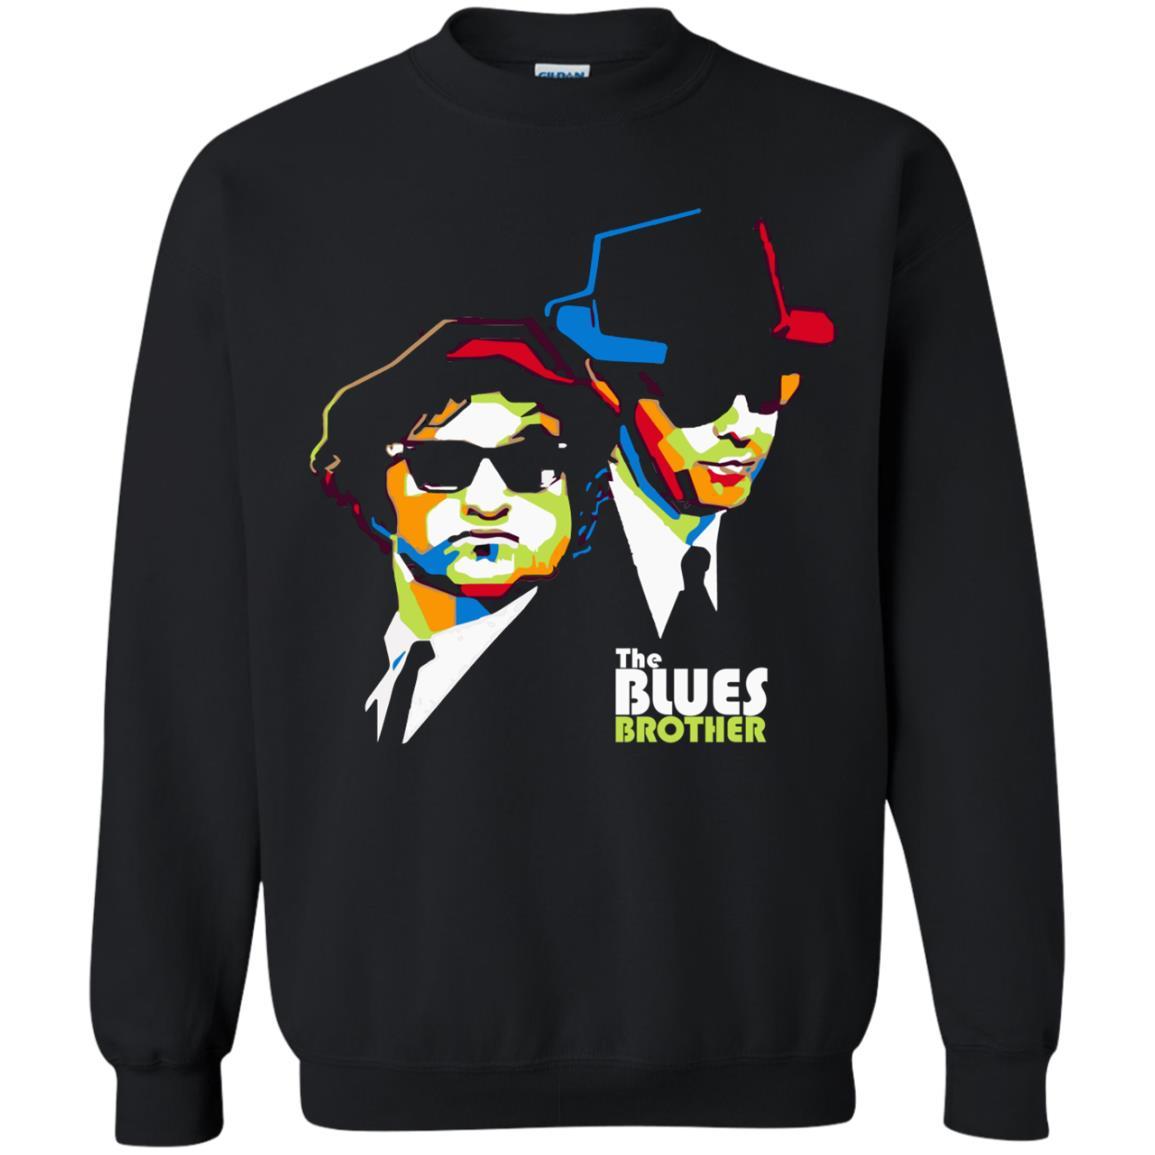 image 645 - The Blues Brother Shirt, Sweatshirt, Hoodie